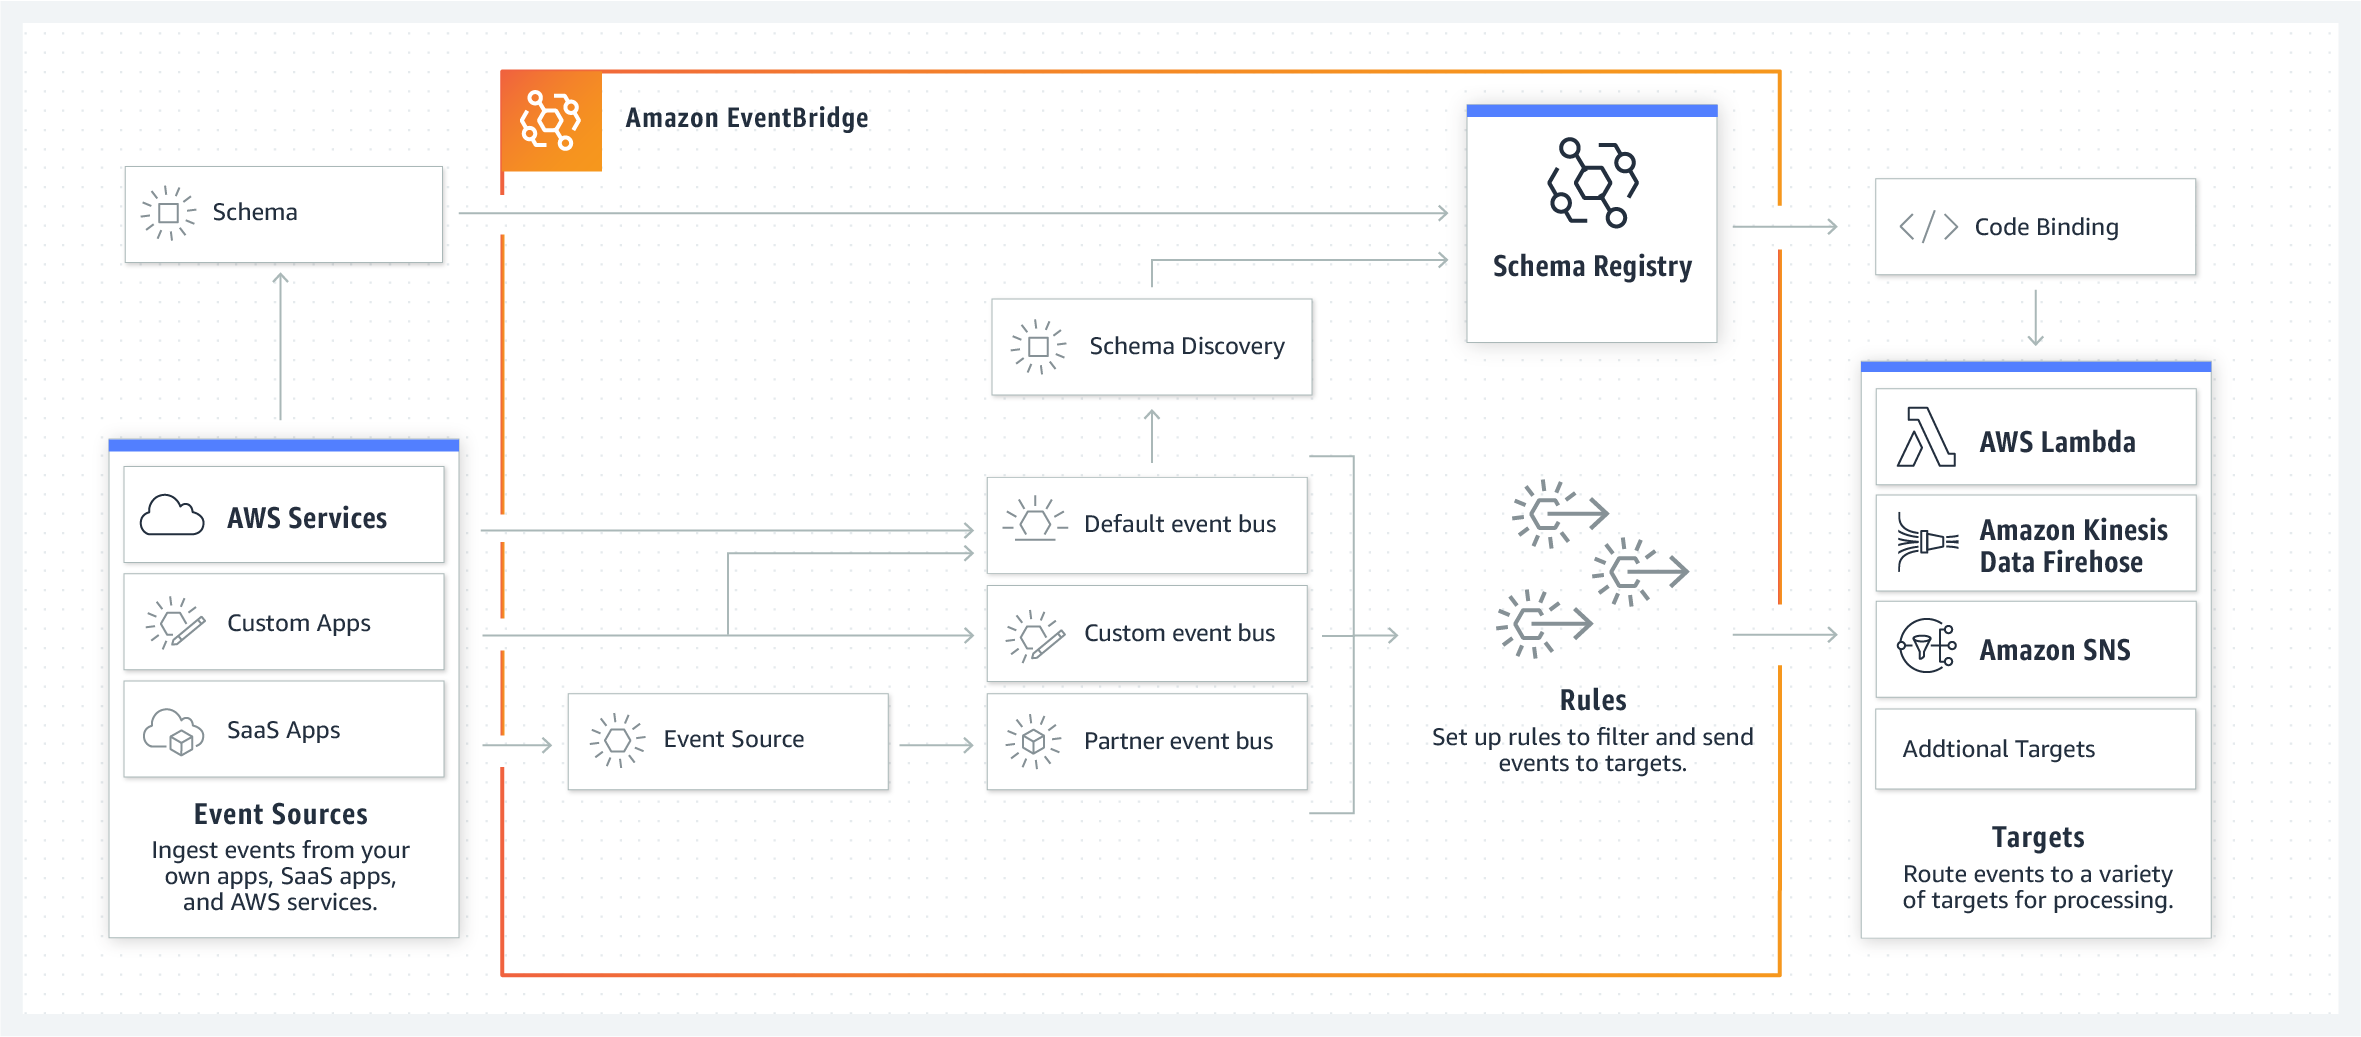 Amazon EventBridge 如何通过事件连接应用程序